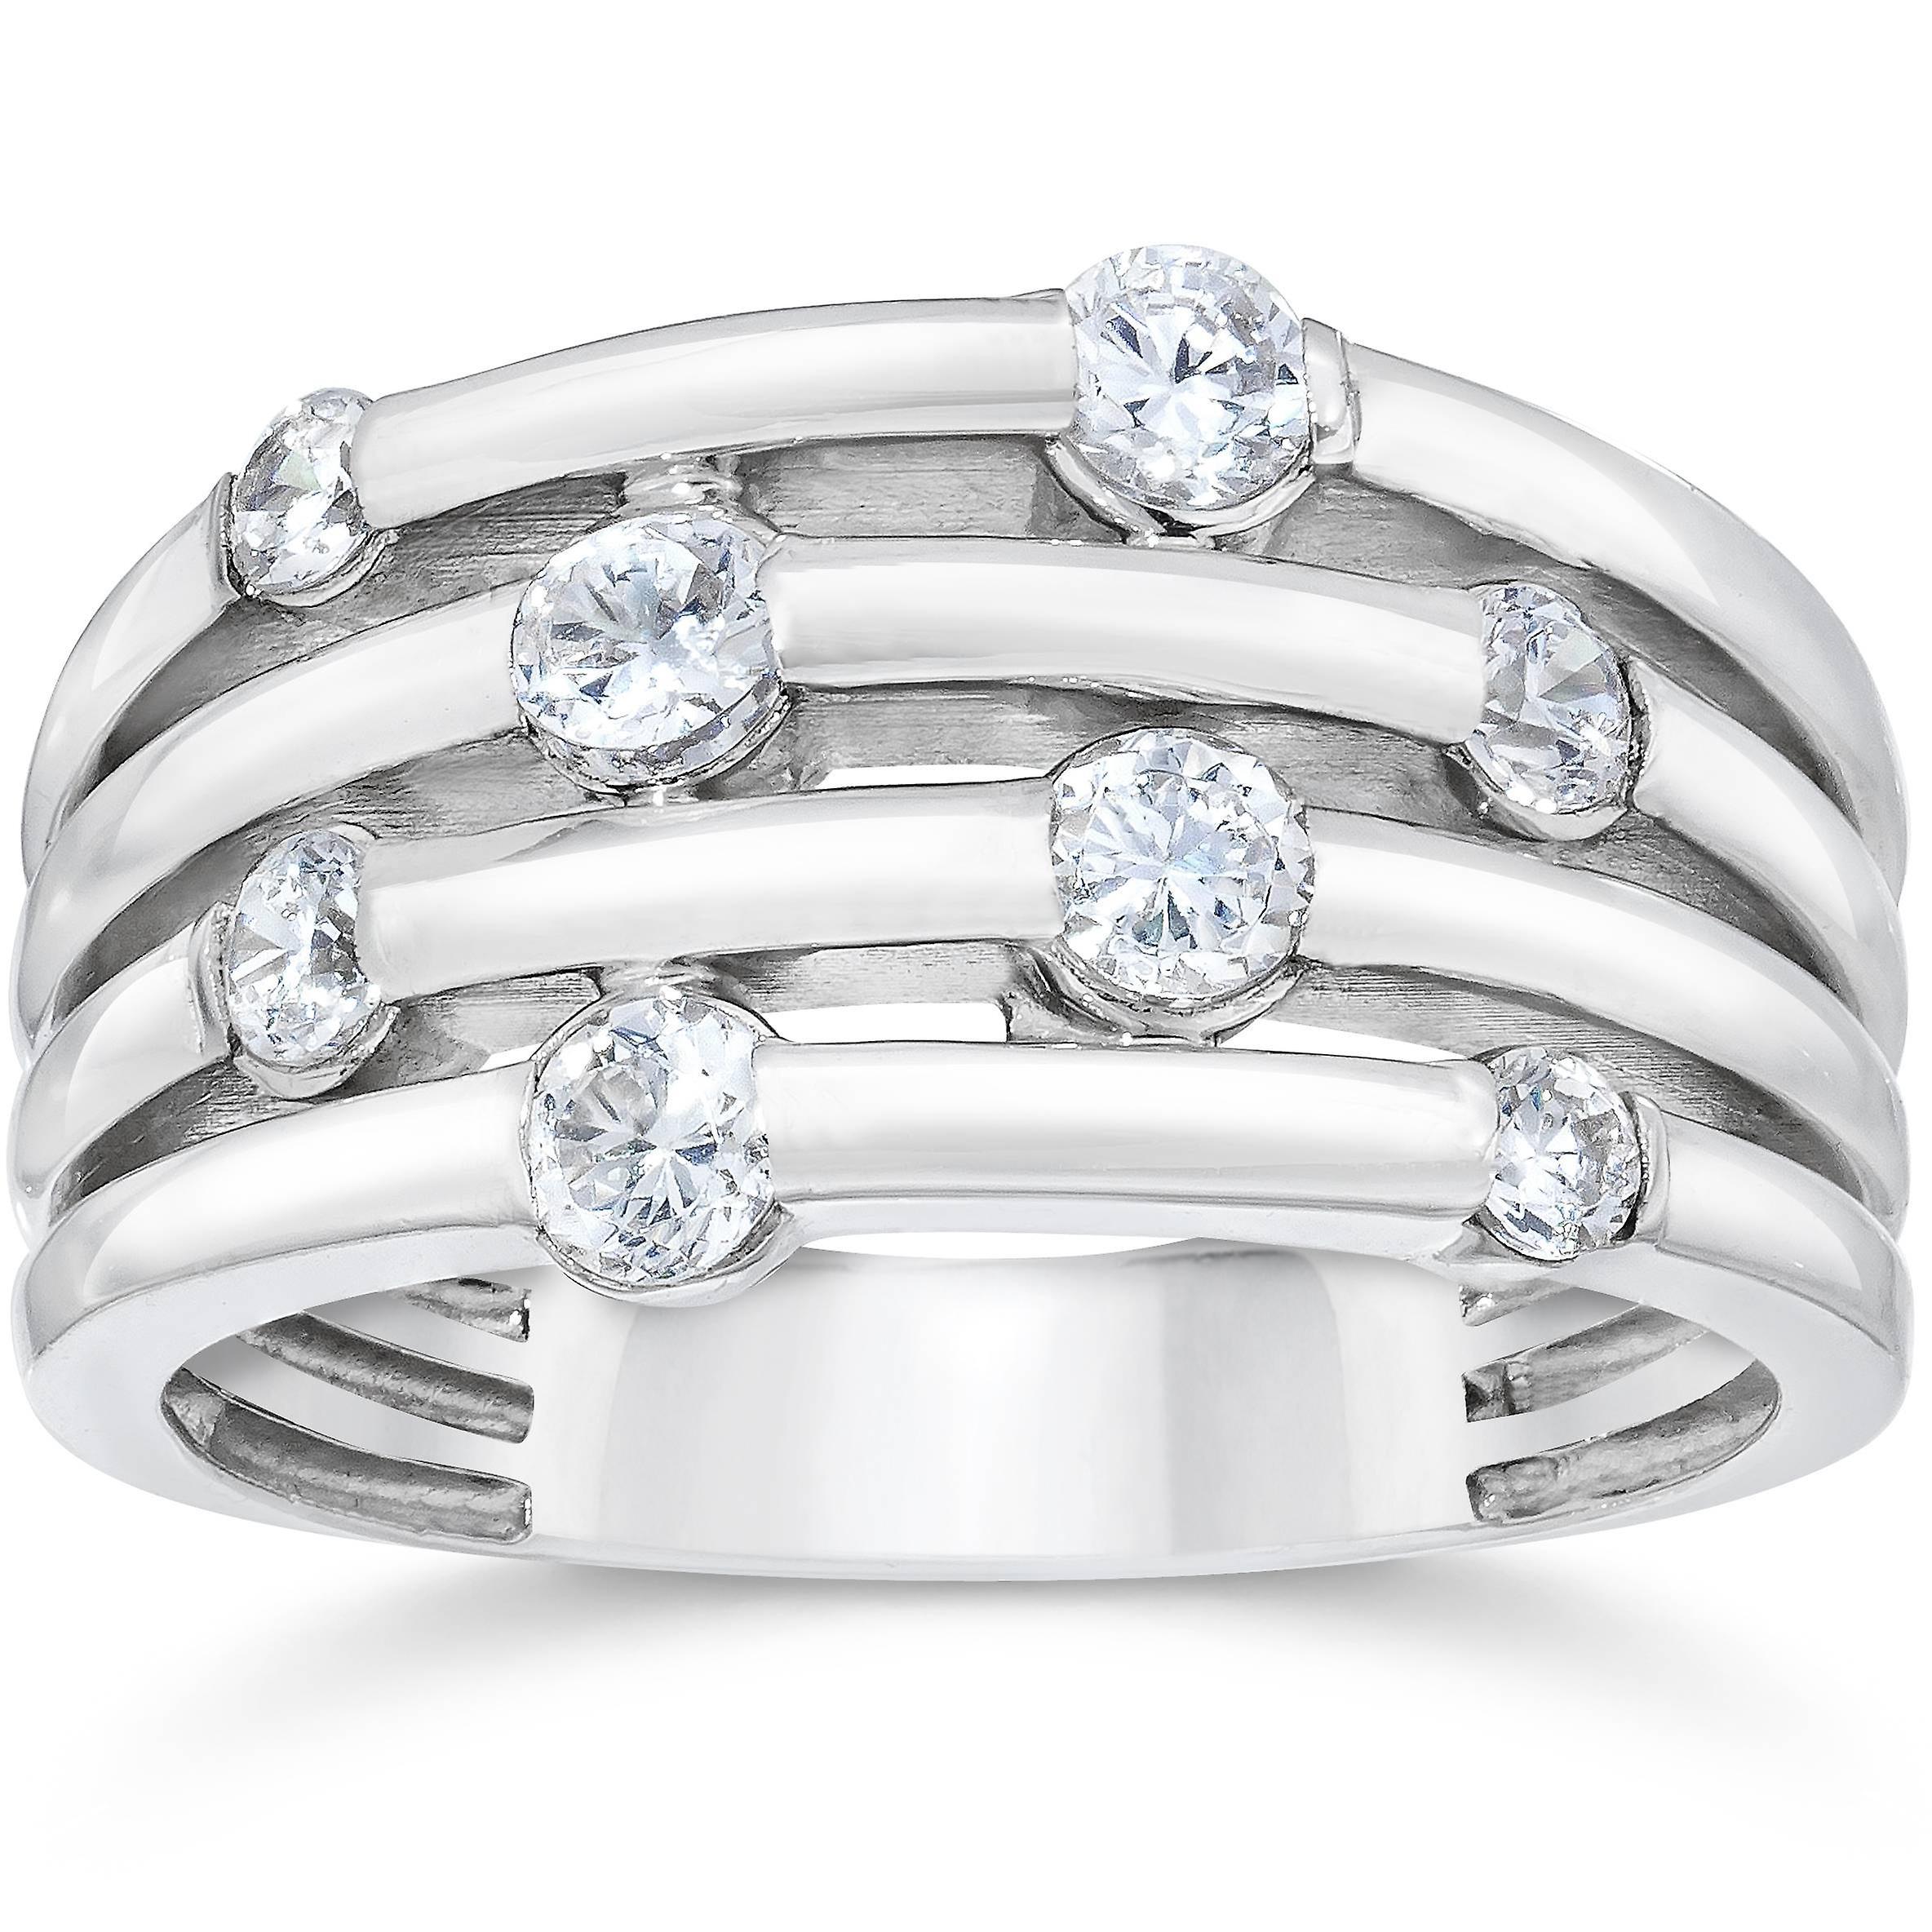 14K blanc or 1ct Real Diamond Right Hand sacue